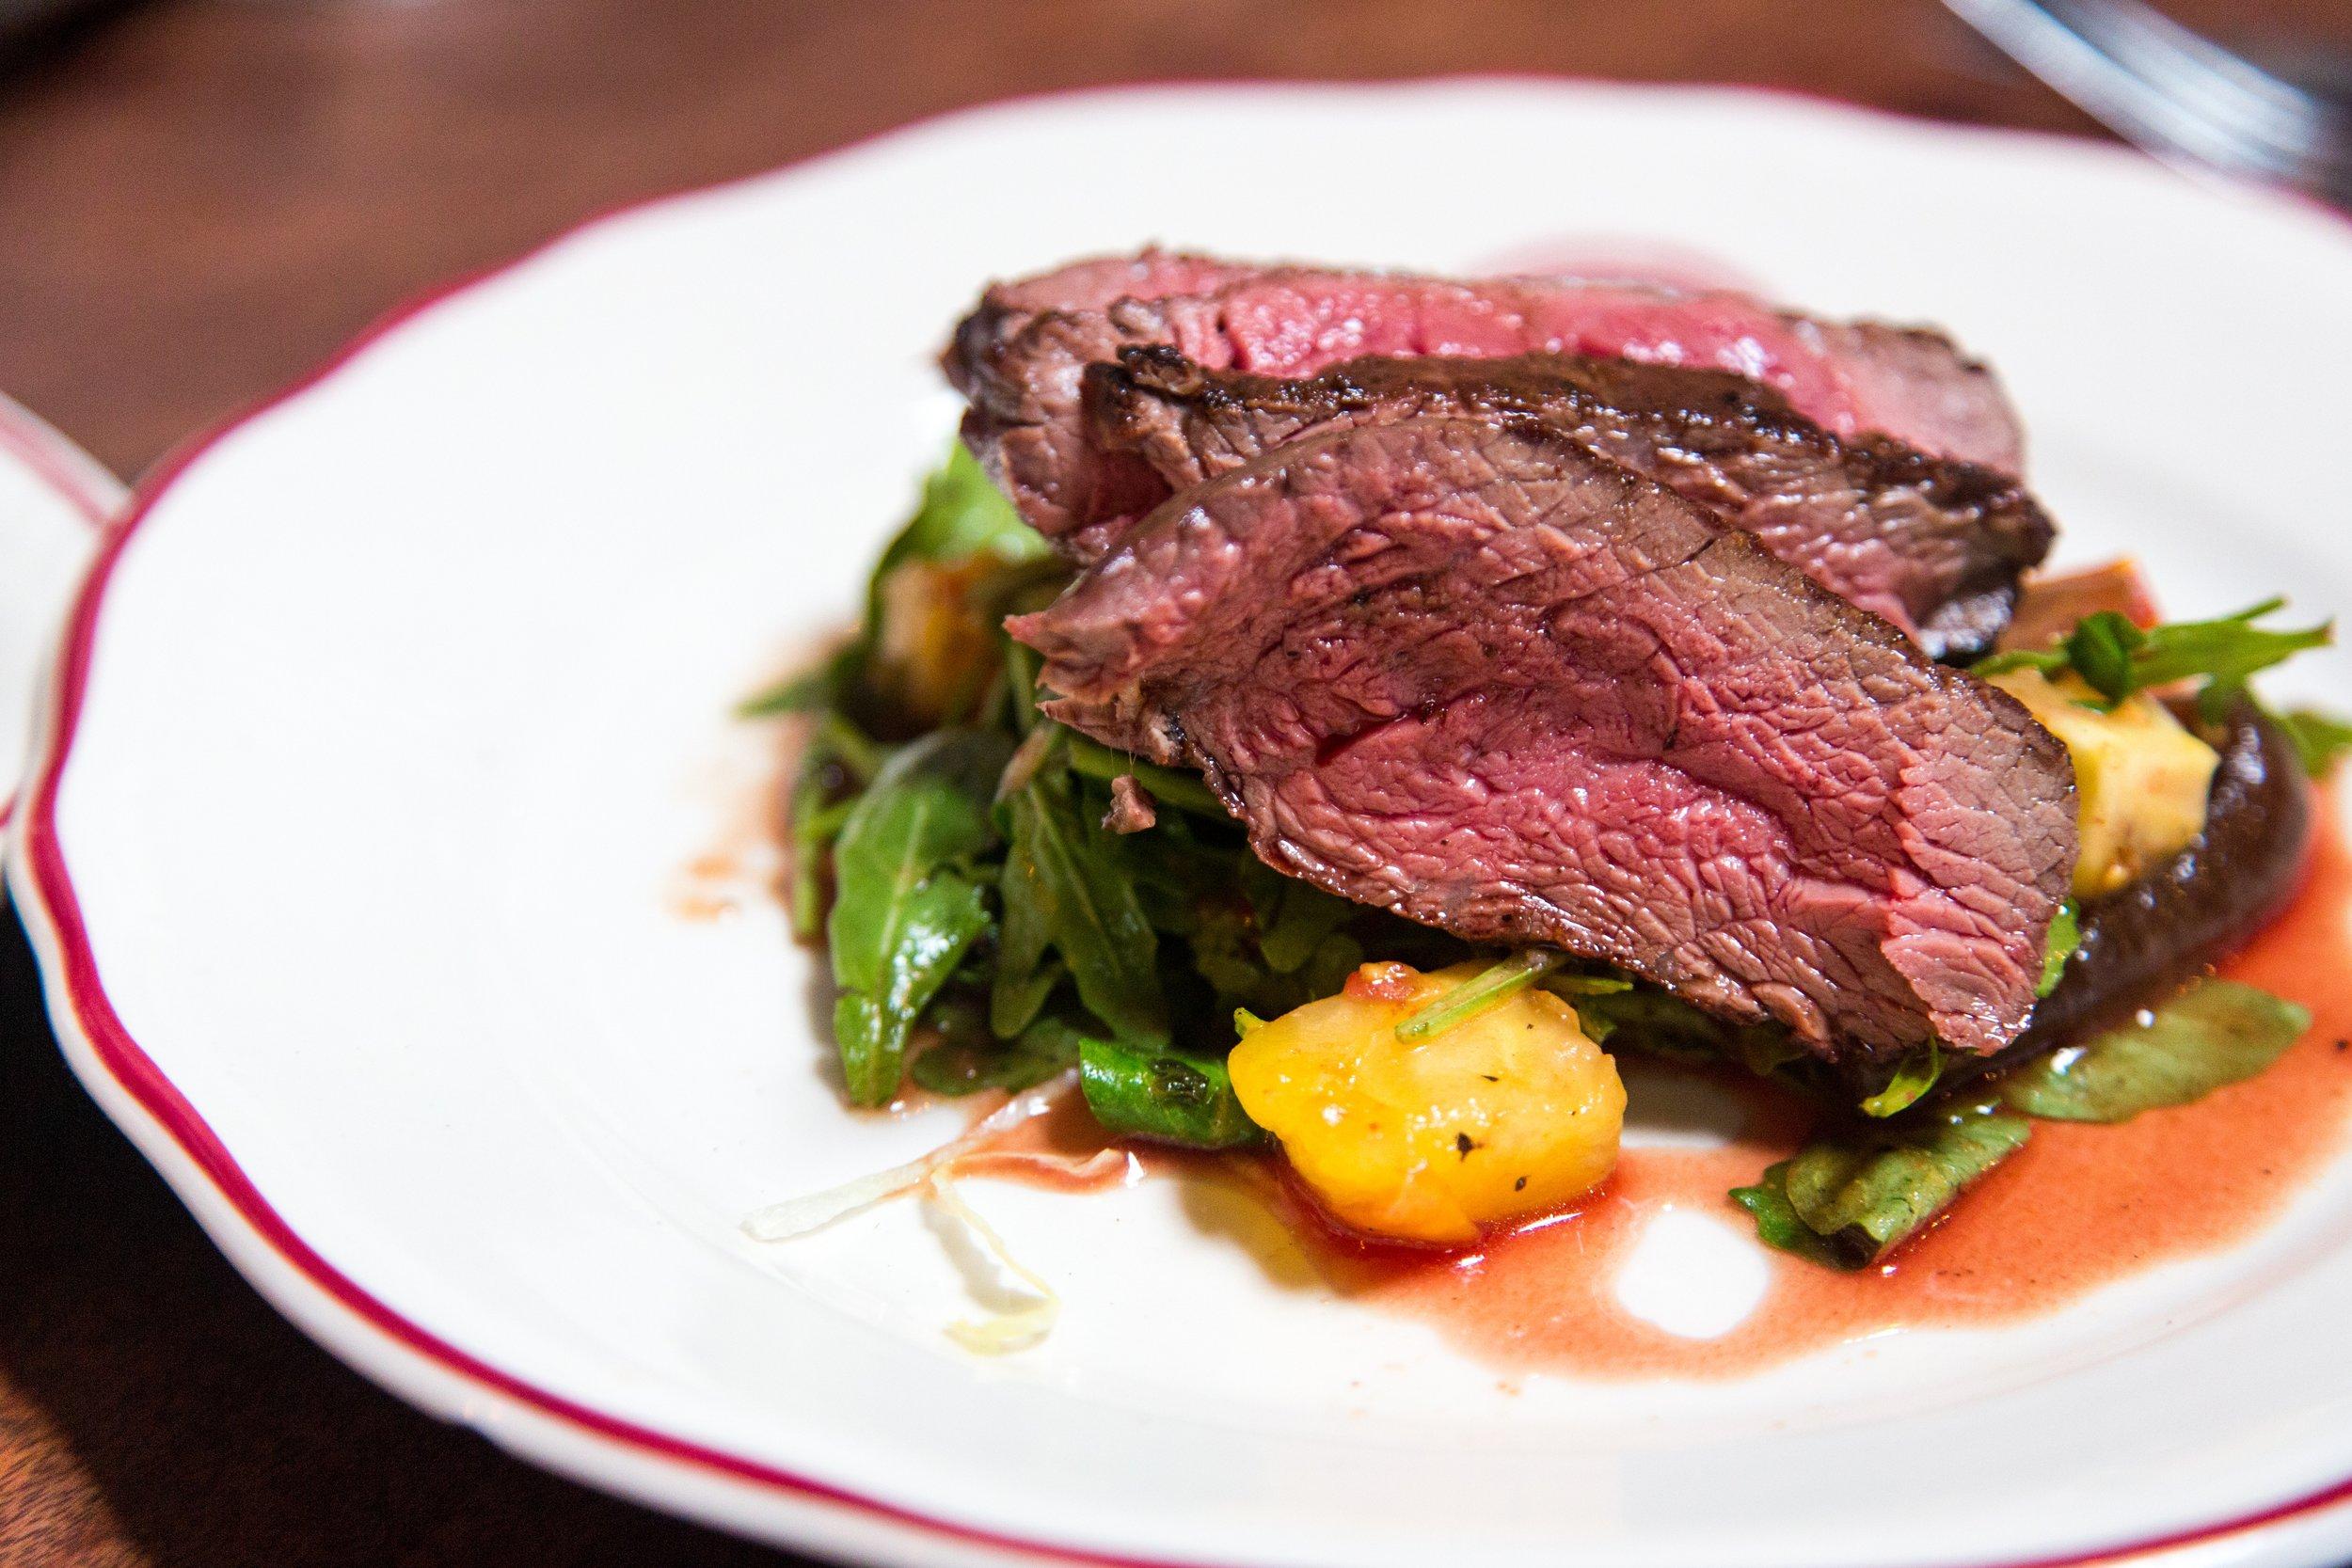 steaks, ribeye, hangar steak, flat iron steak, filet minon